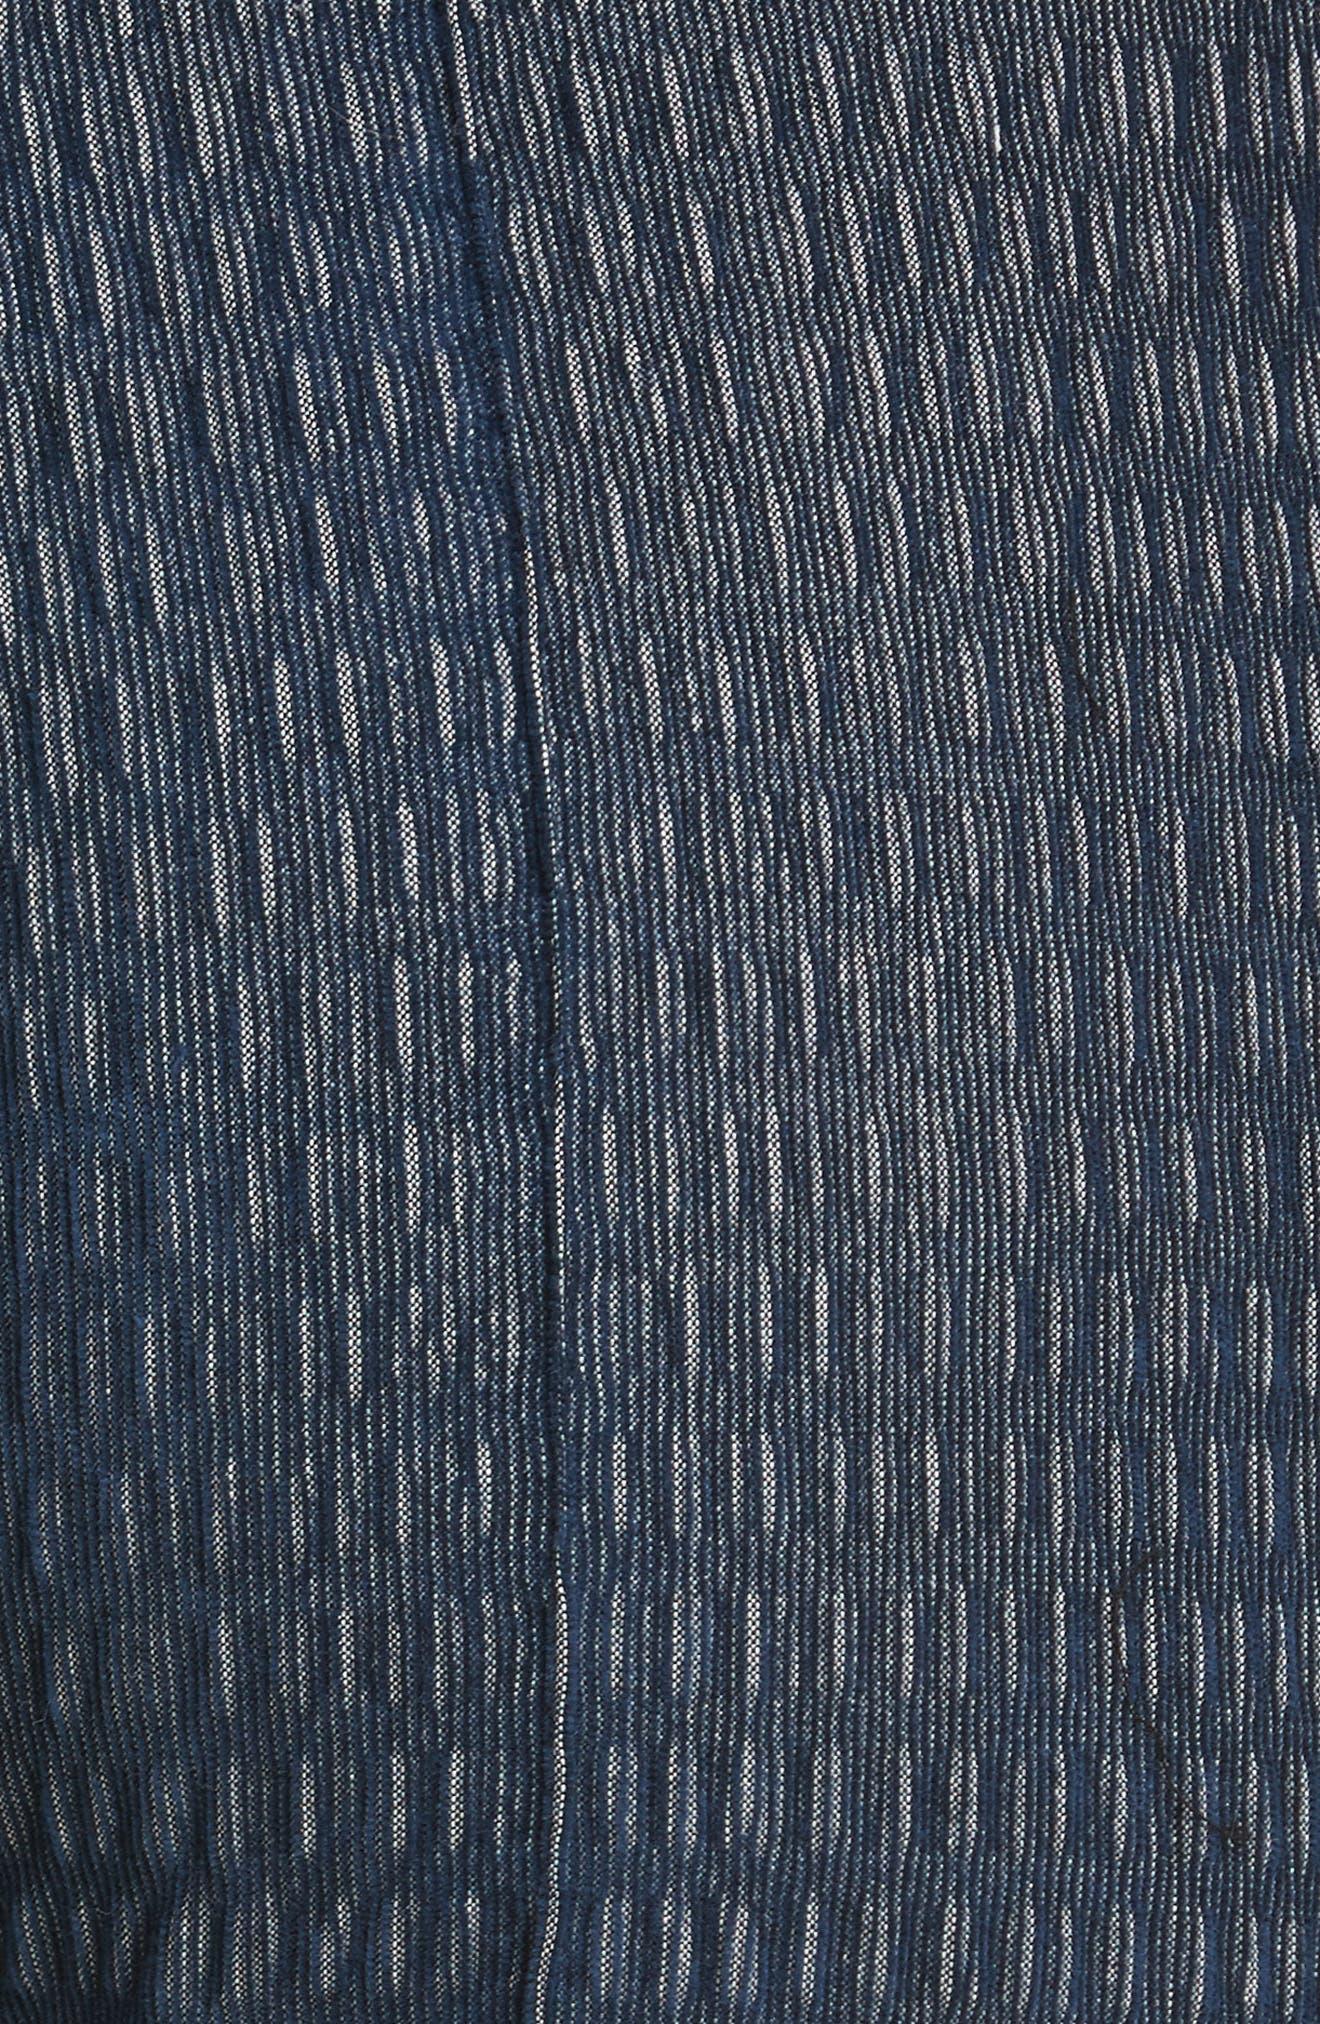 Mara Cloquer Jersey Pants,                             Alternate thumbnail 5, color,                             400